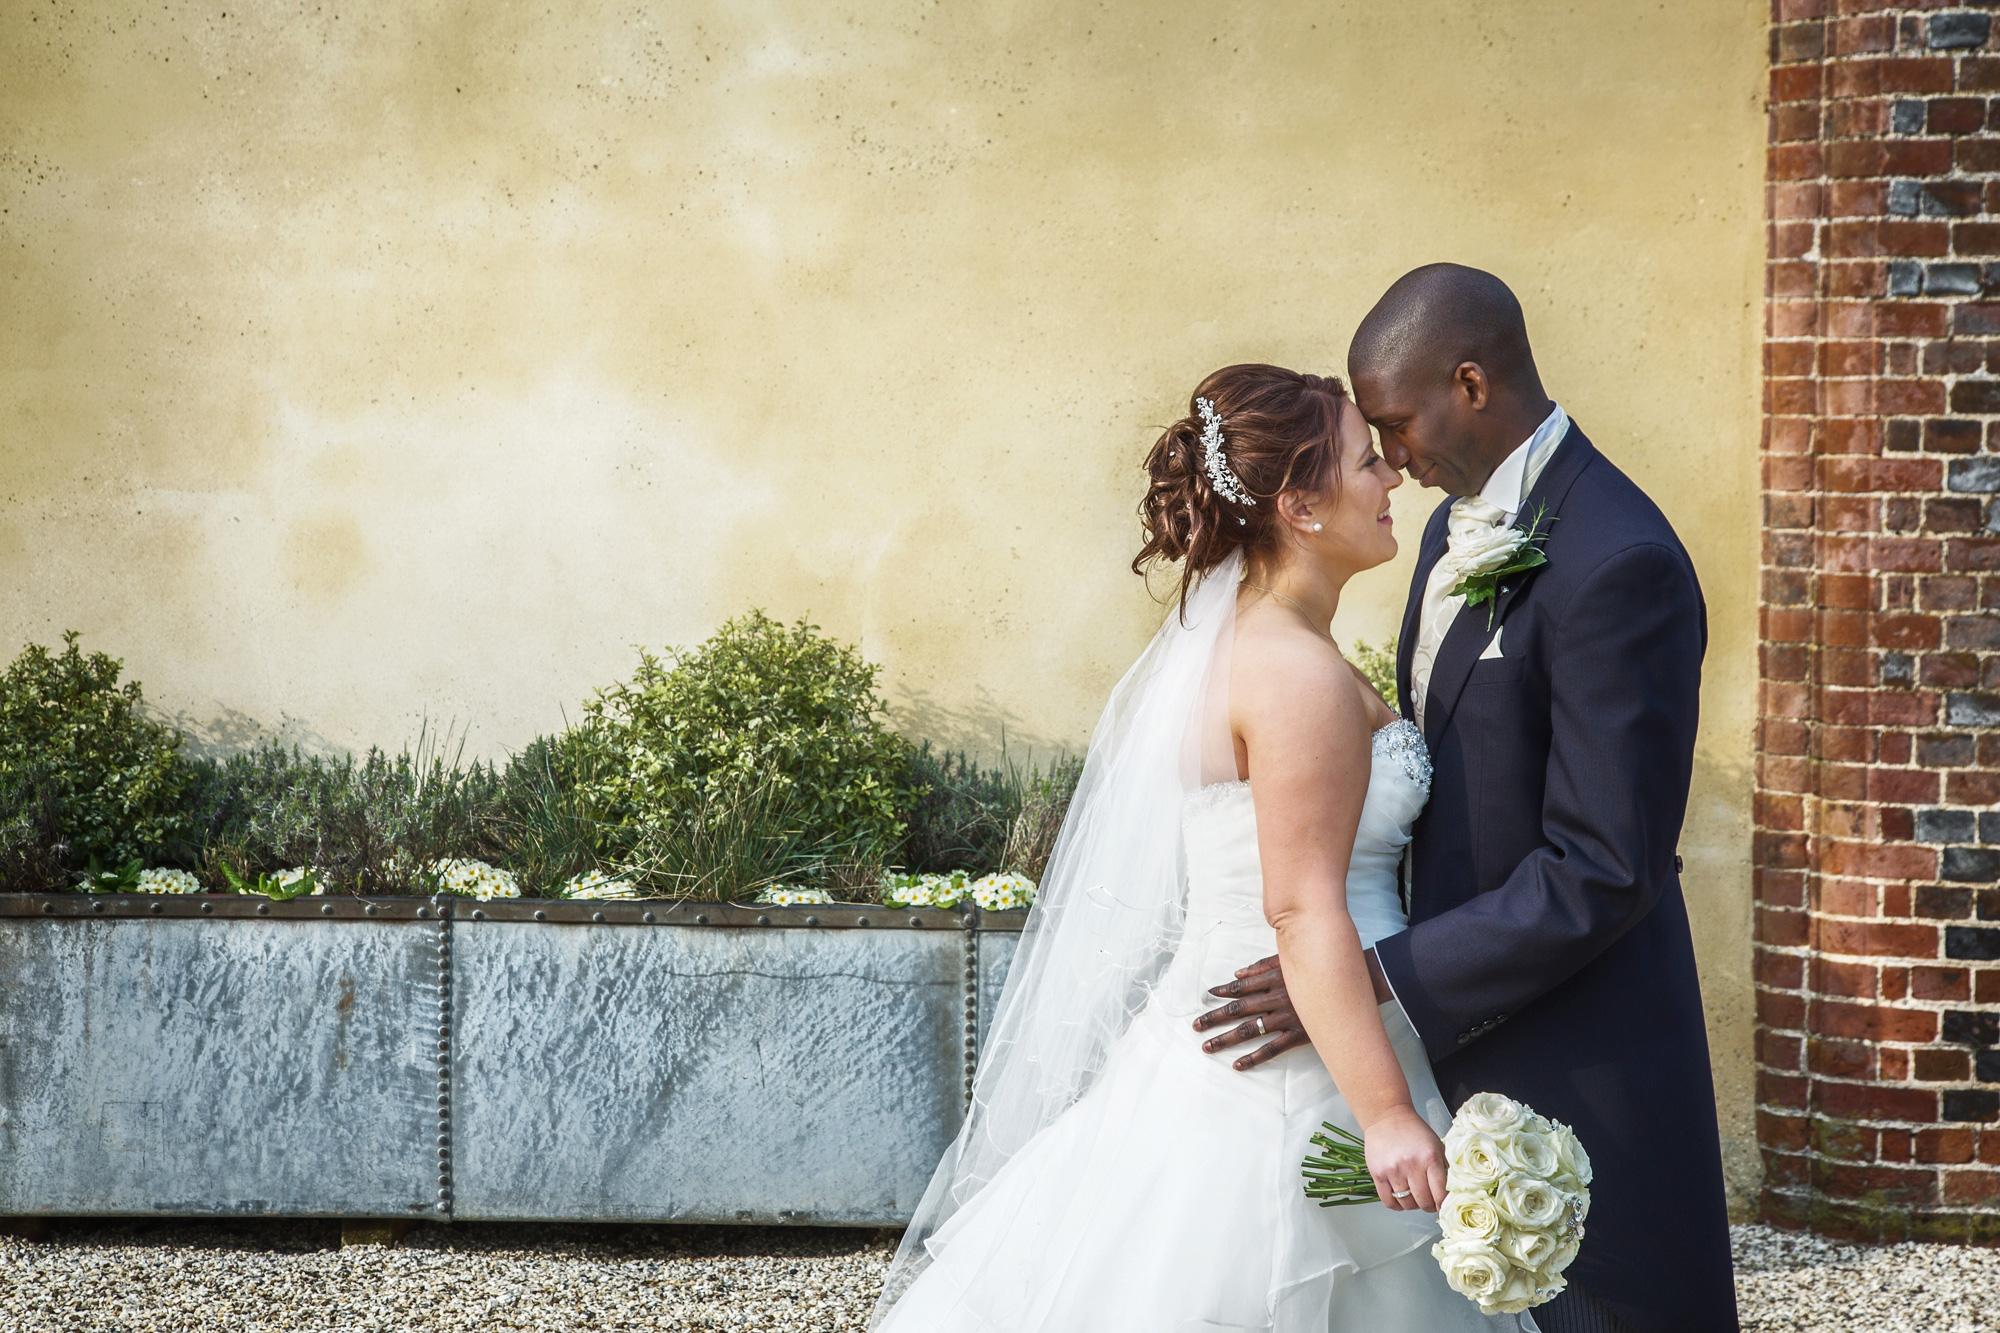 Adam_Hillier_Wedding_Photographer_Newbury_Berkshire_3 (8).jpg